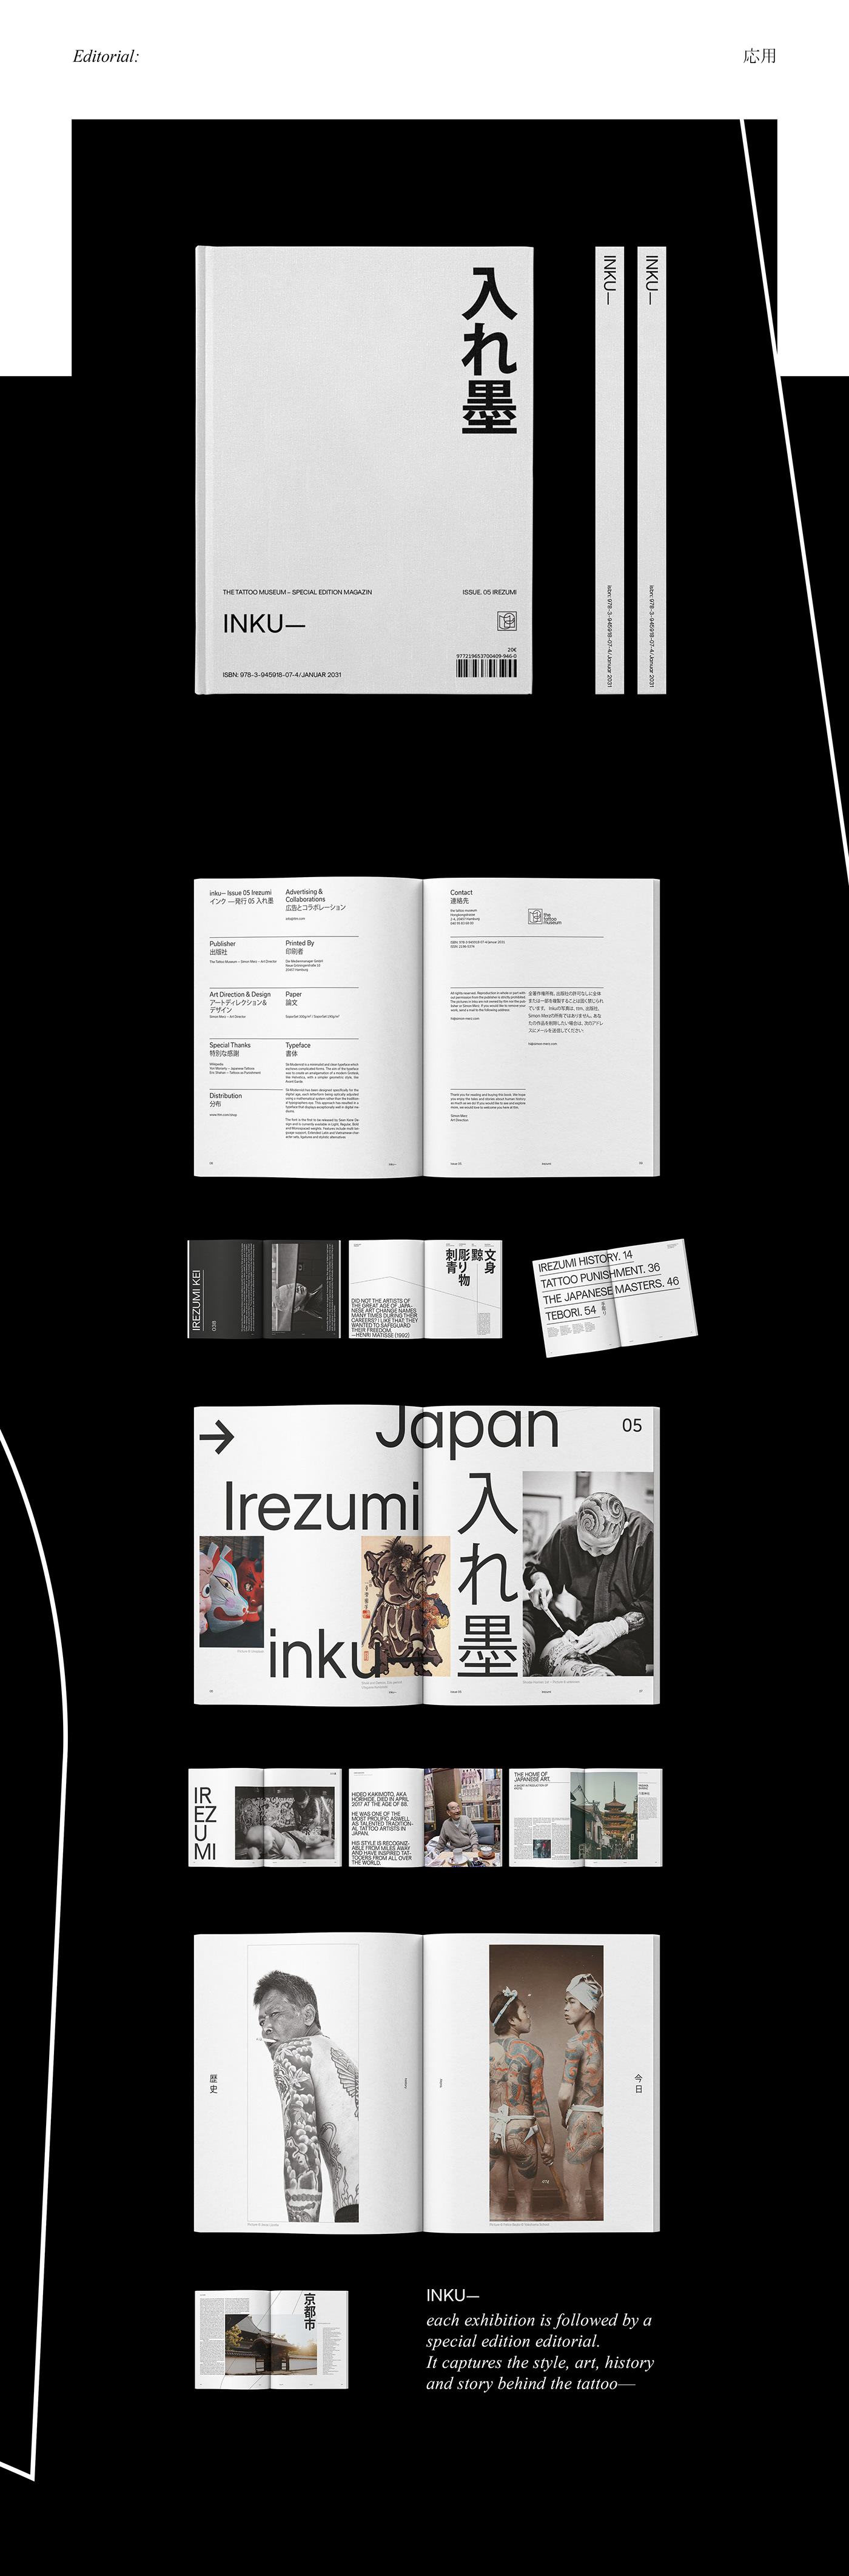 art bachelor corporate design editorial Exhibition  identity museum tattoo type